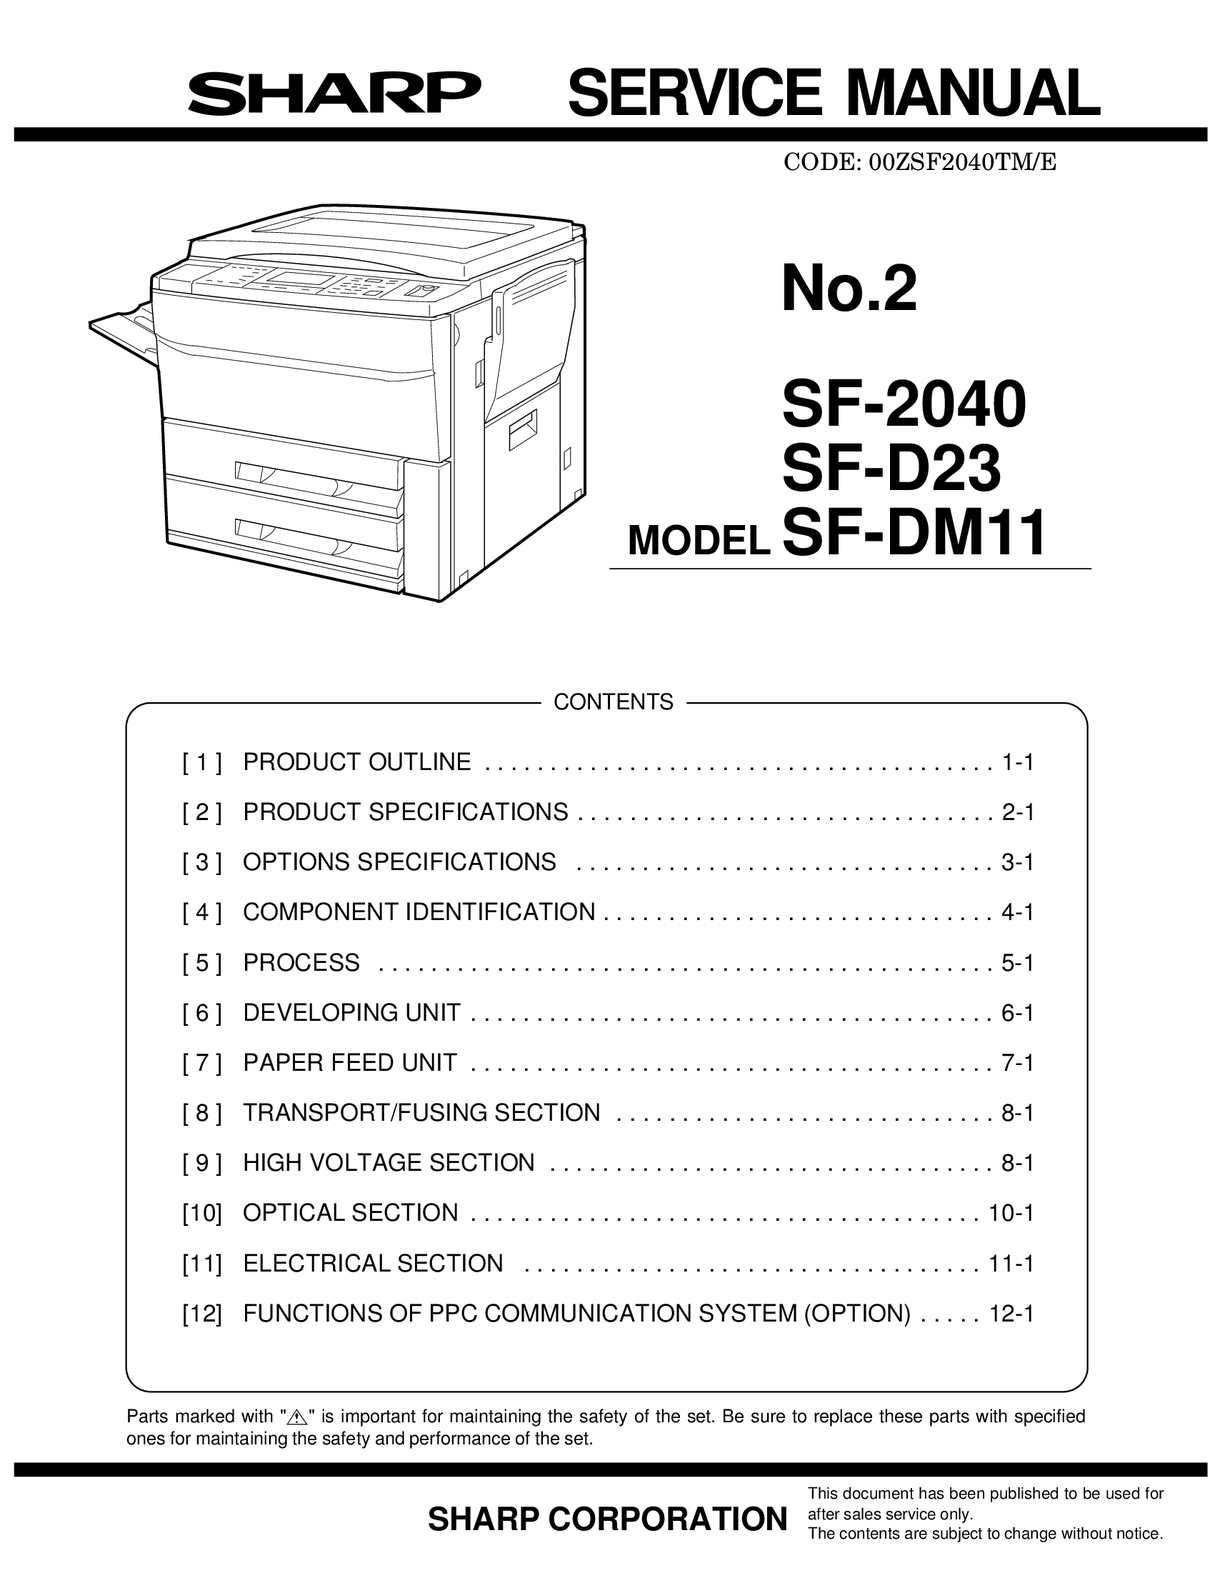 Pwb-f-aes-121 Calam̩o РService Manual Sharp Sf 2040 Sme Of Pwb-f-aes-121